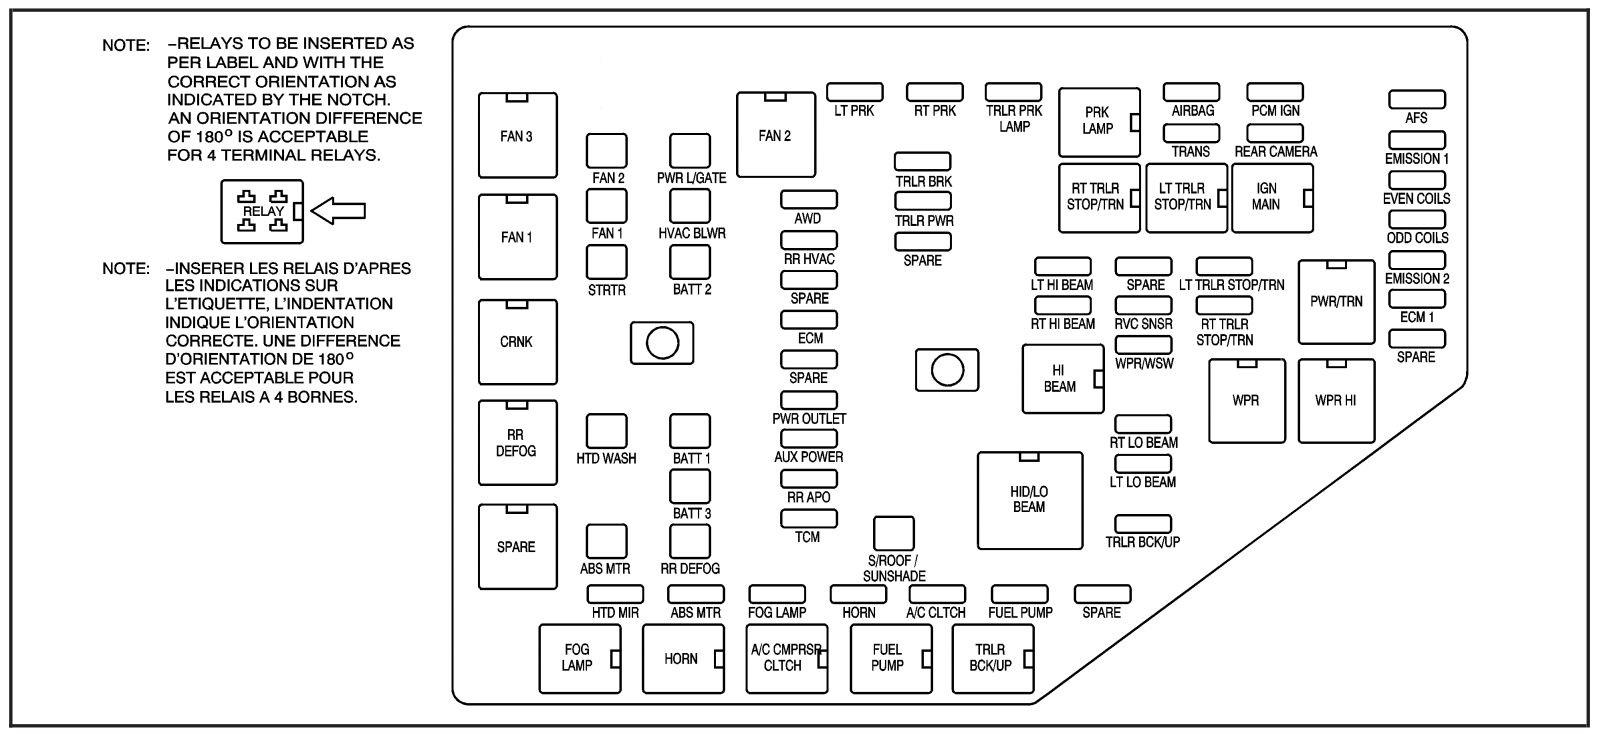 2008 dodge grand caravan fuse box diagram kc 5863  2000 dodge avenger center under the dash fuse box diagram  dash fuse box diagram